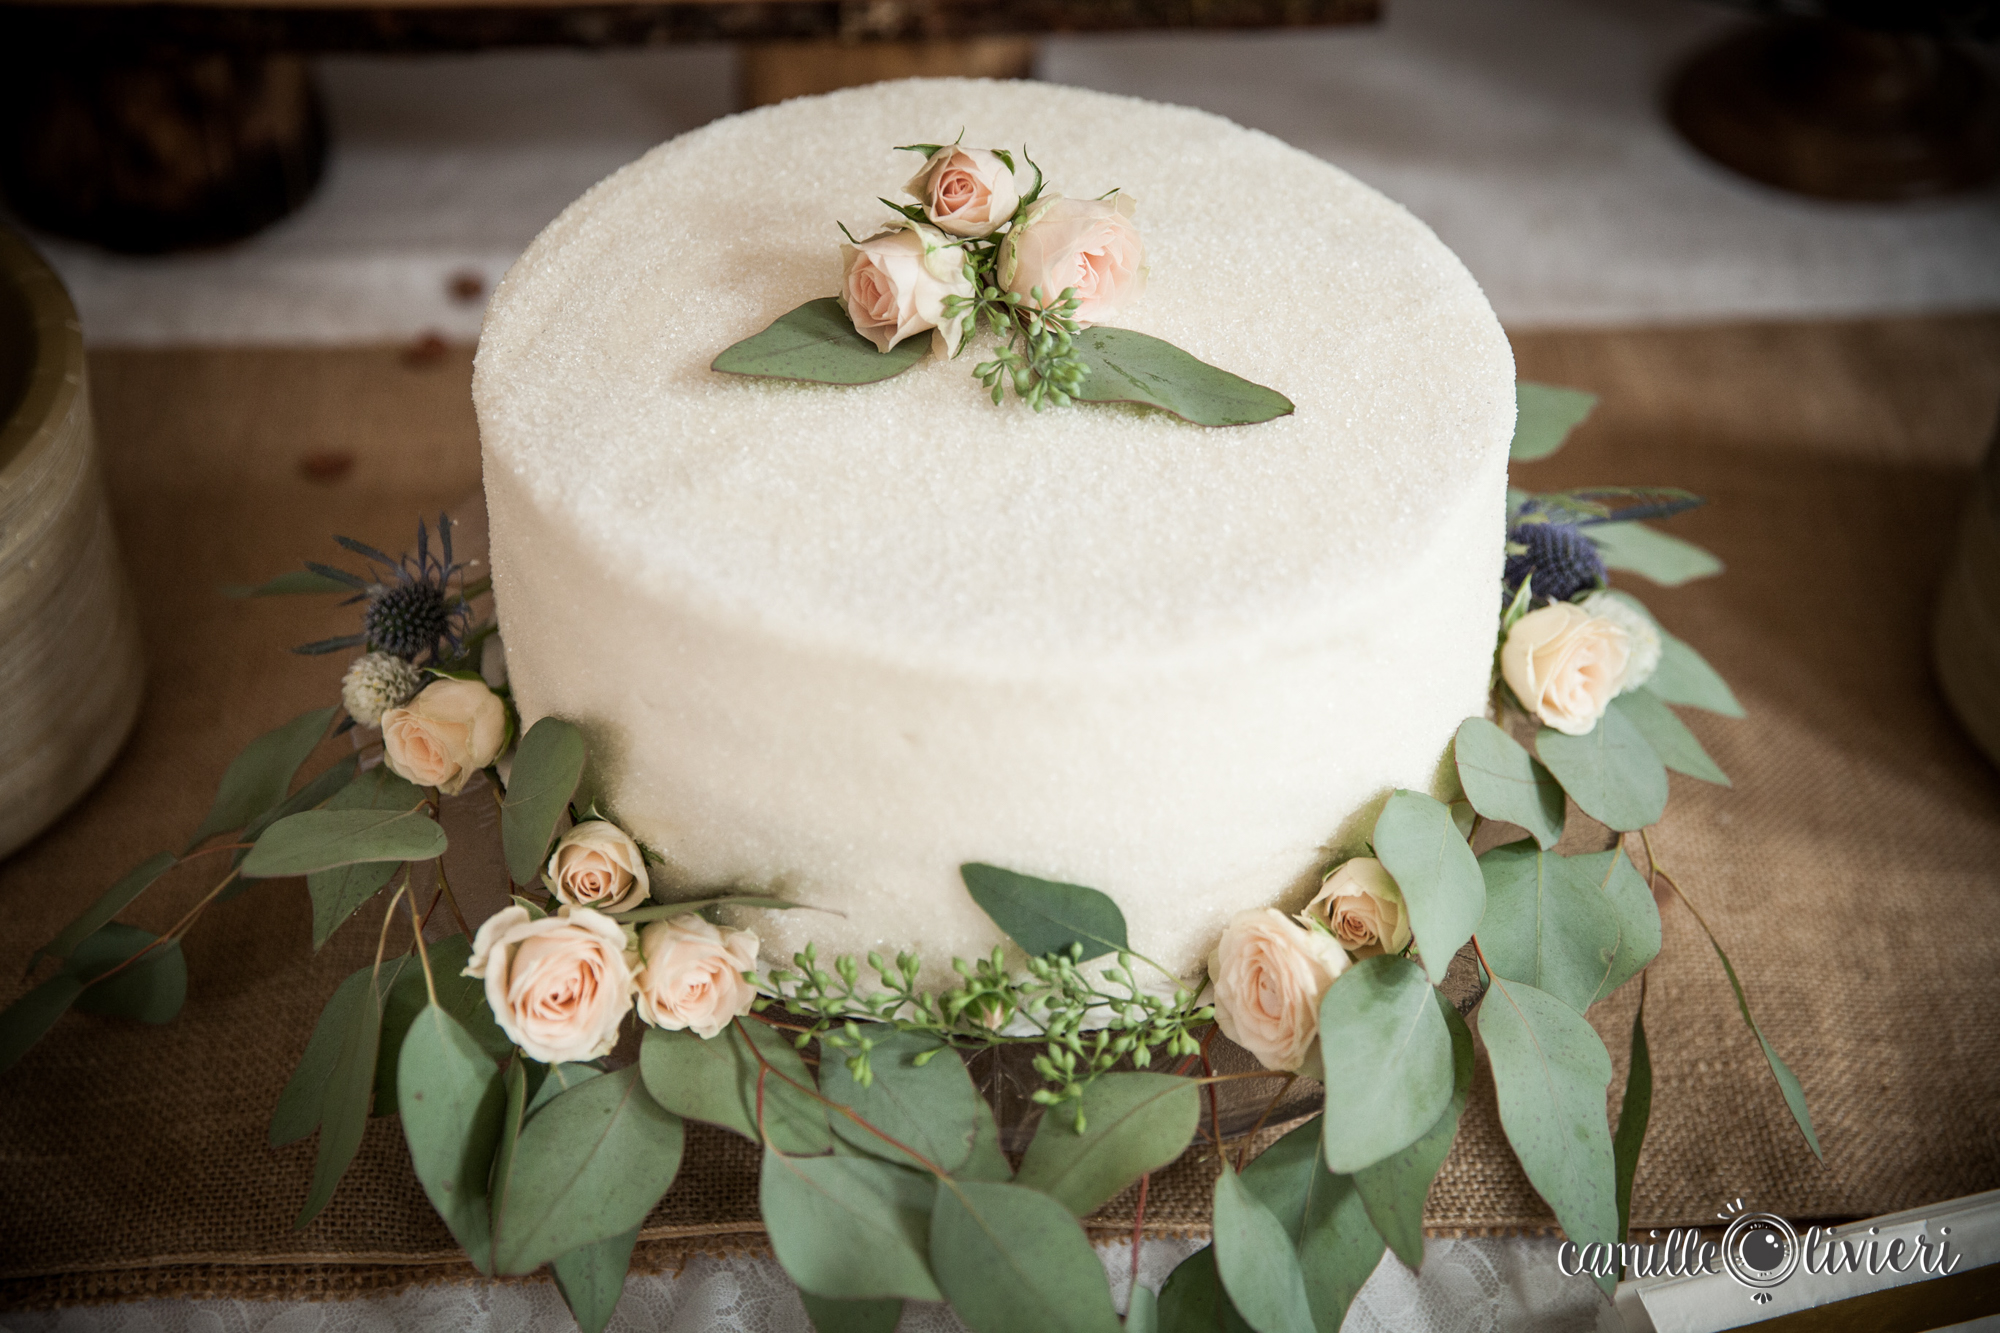 photographe_grenoble_mariage-camille-olivieri-26